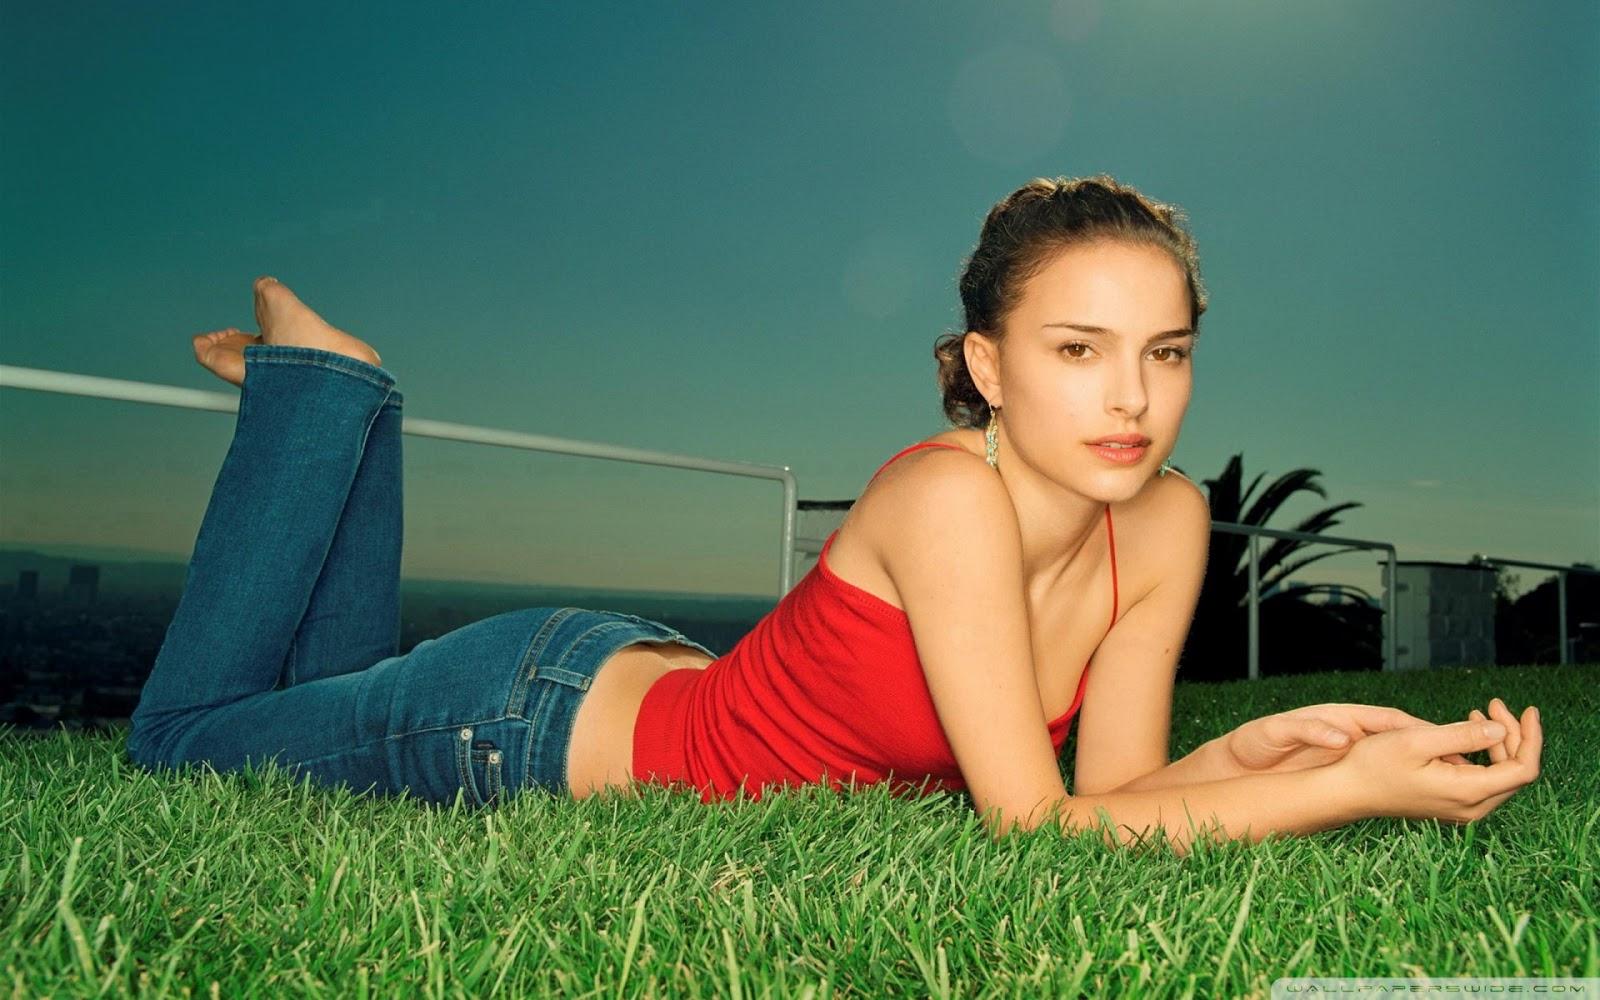 Natalie Portman Actress HD Wallpaper